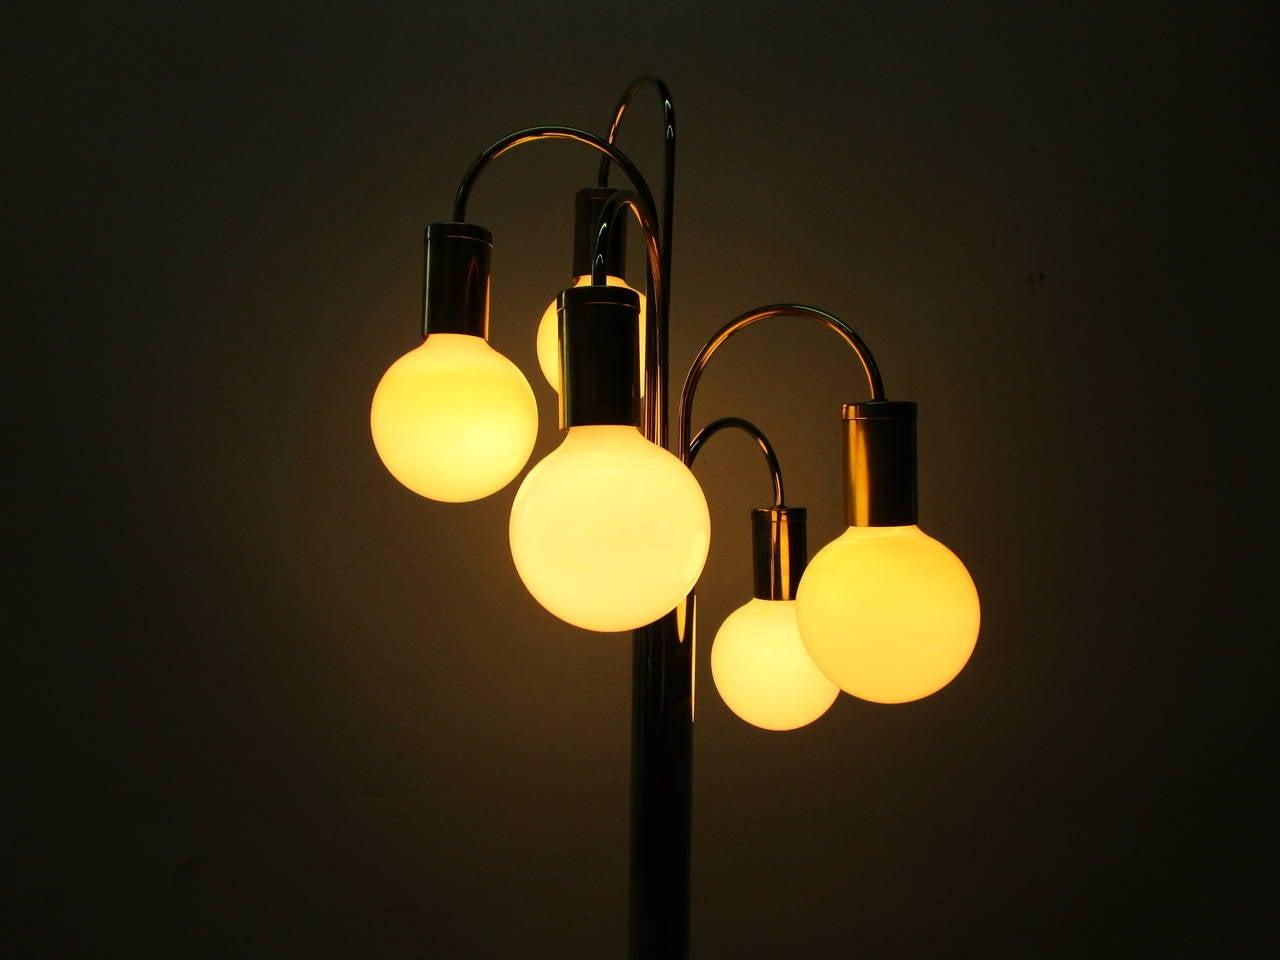 Waterfall Five-Arm Brass  Floor Lamp by Robert Sonneman For Sale 1